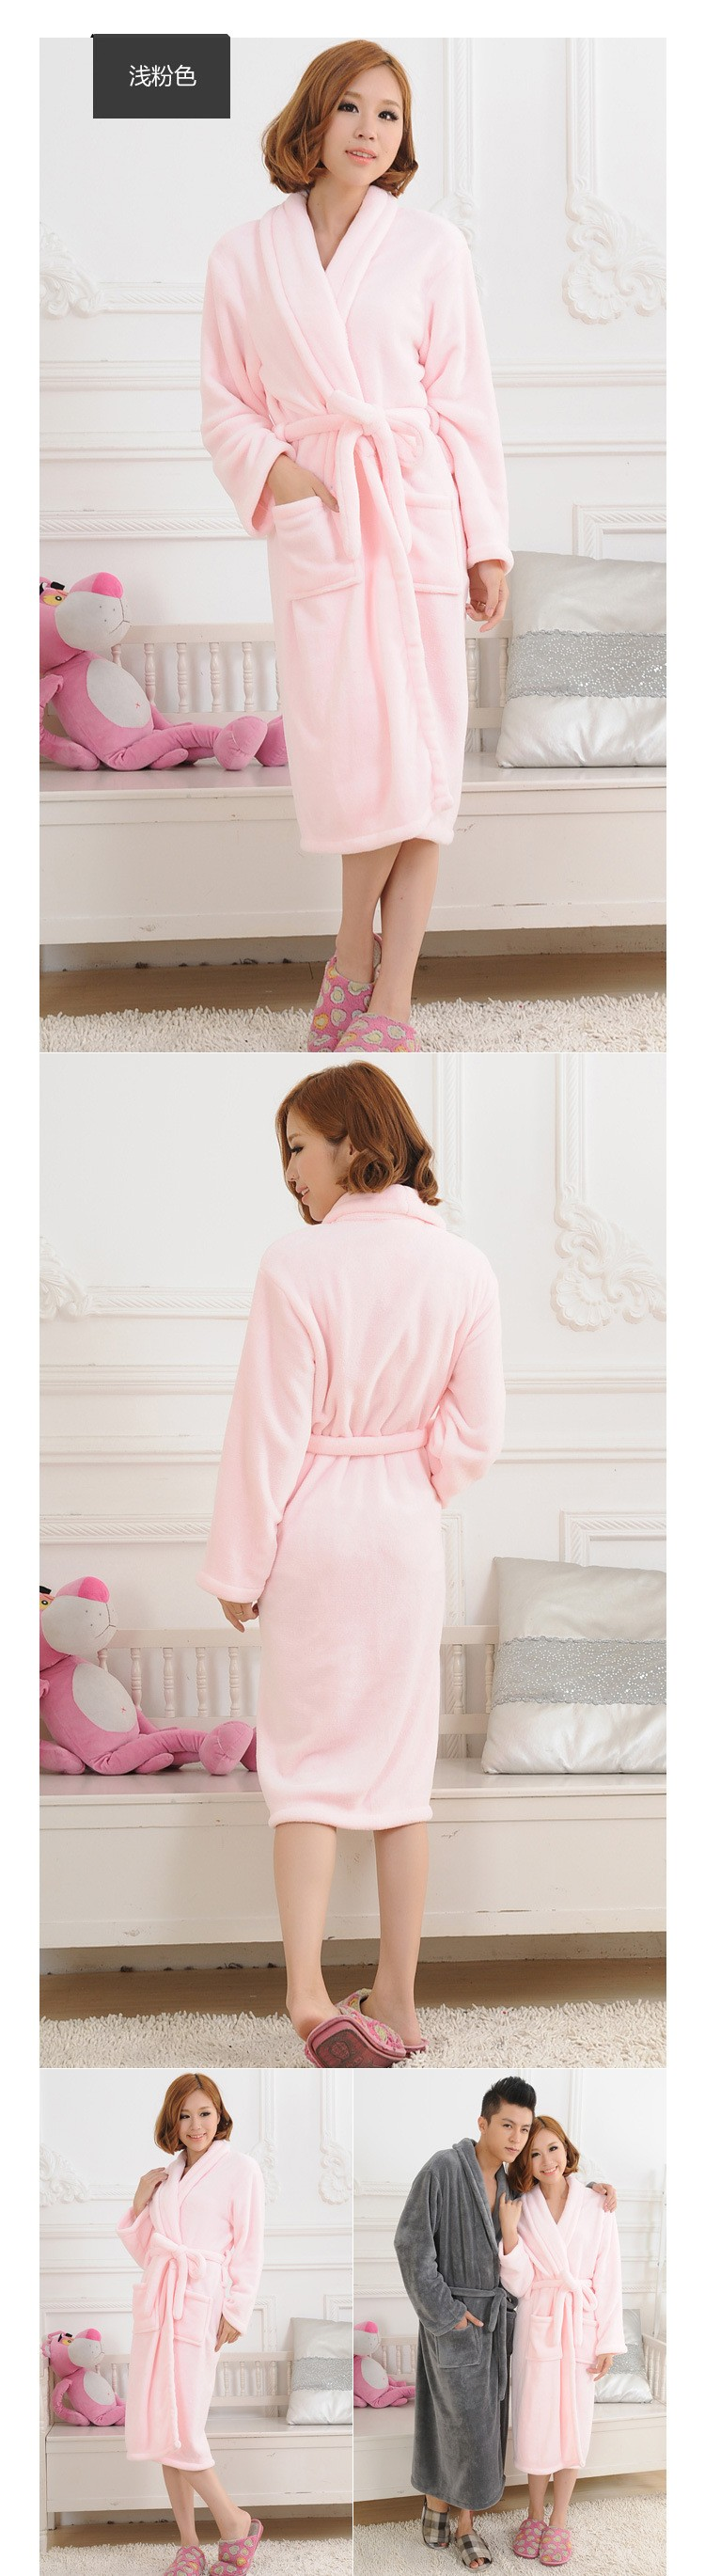 bathrobe (8)